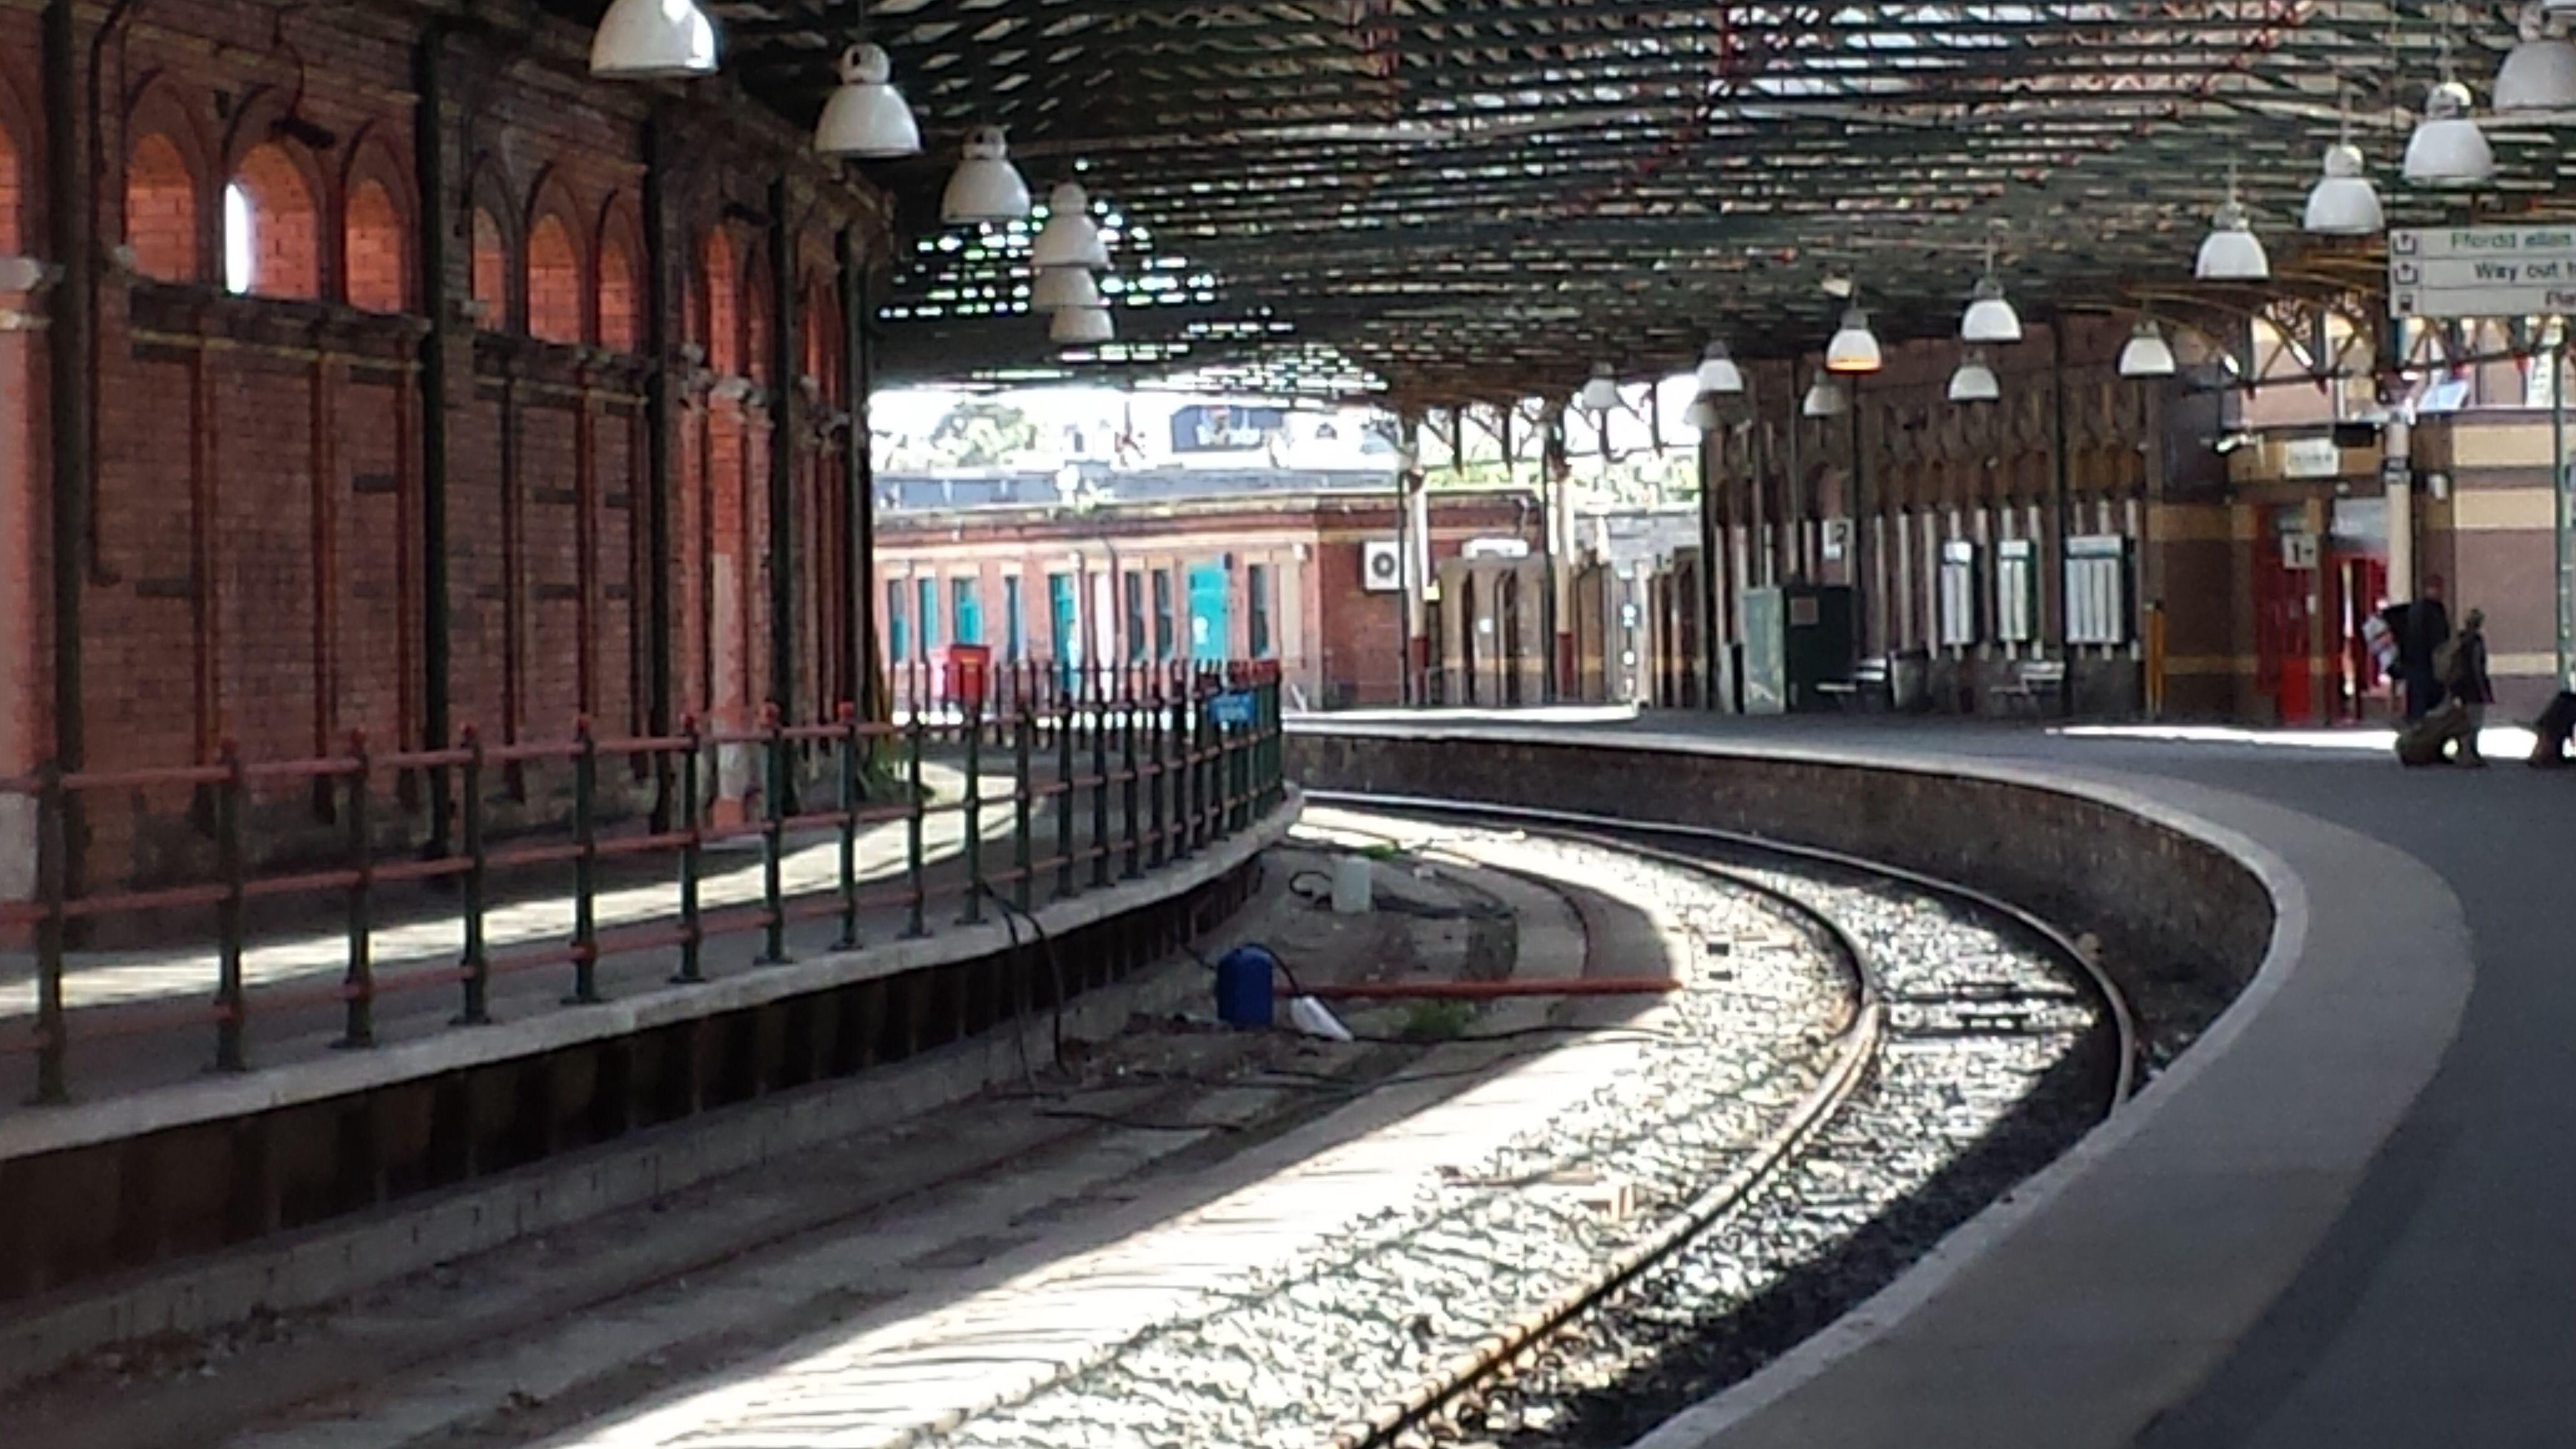 Holyhead Station, Wales